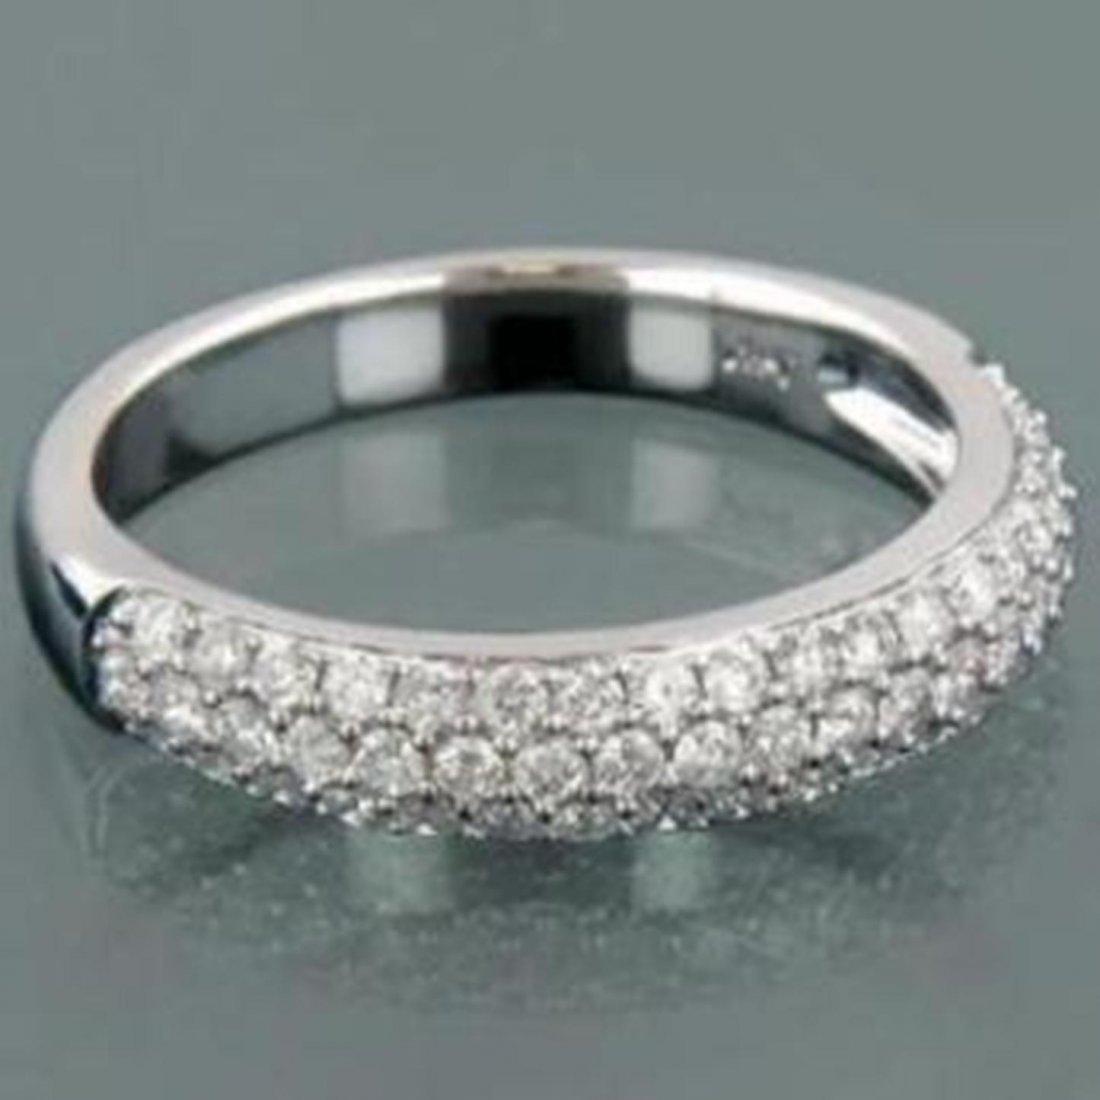 185: Stunning Woman's Diamond Ring 1.17 carat 14k W/G